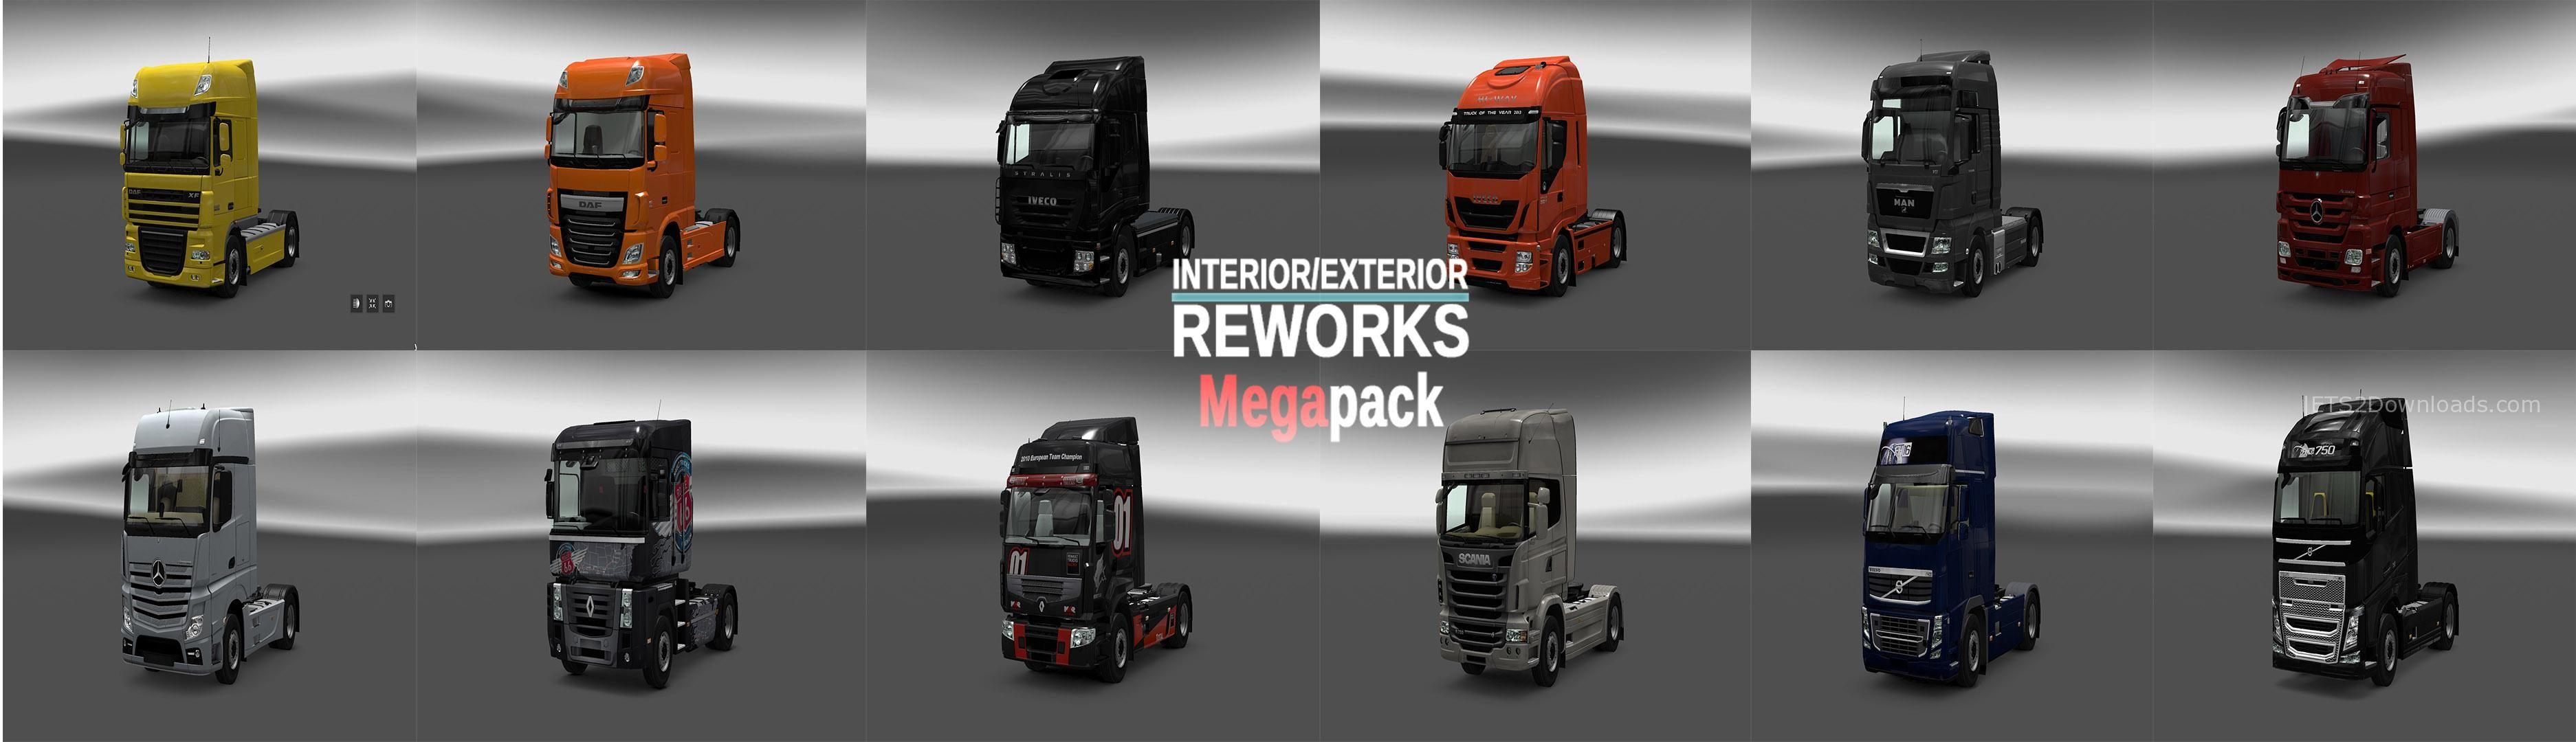 interior-exterior-reworks-megapack-2